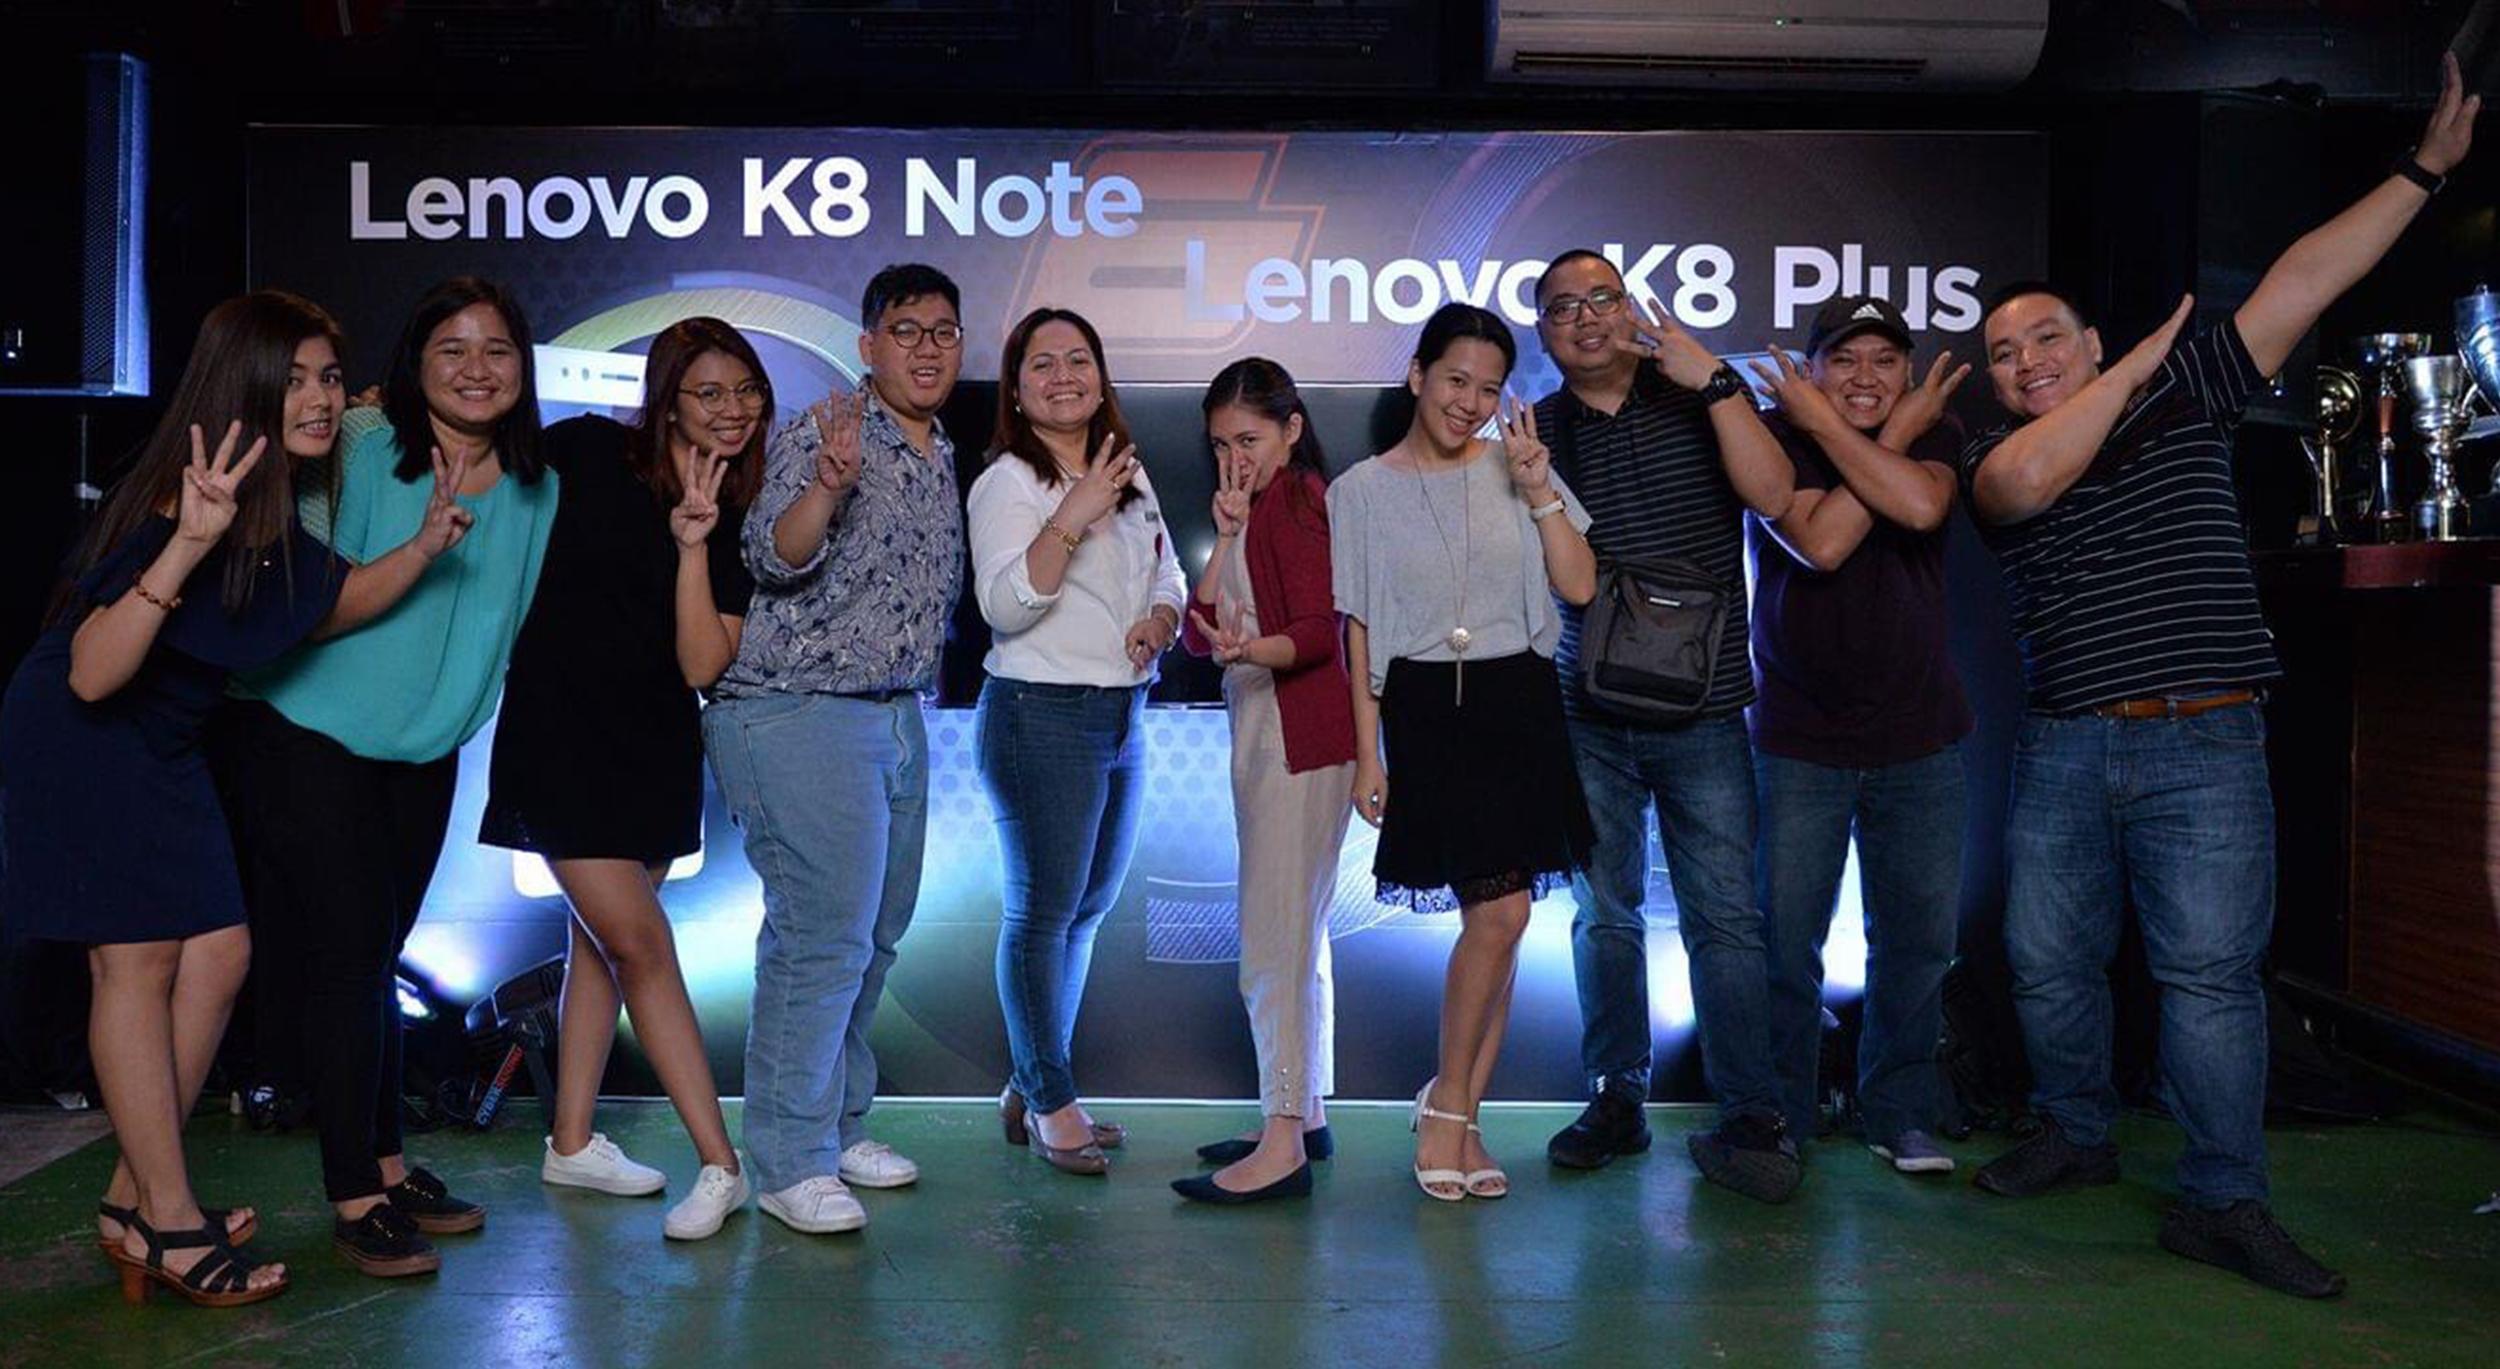 Lenovo K8 Note Launch - Team Photo